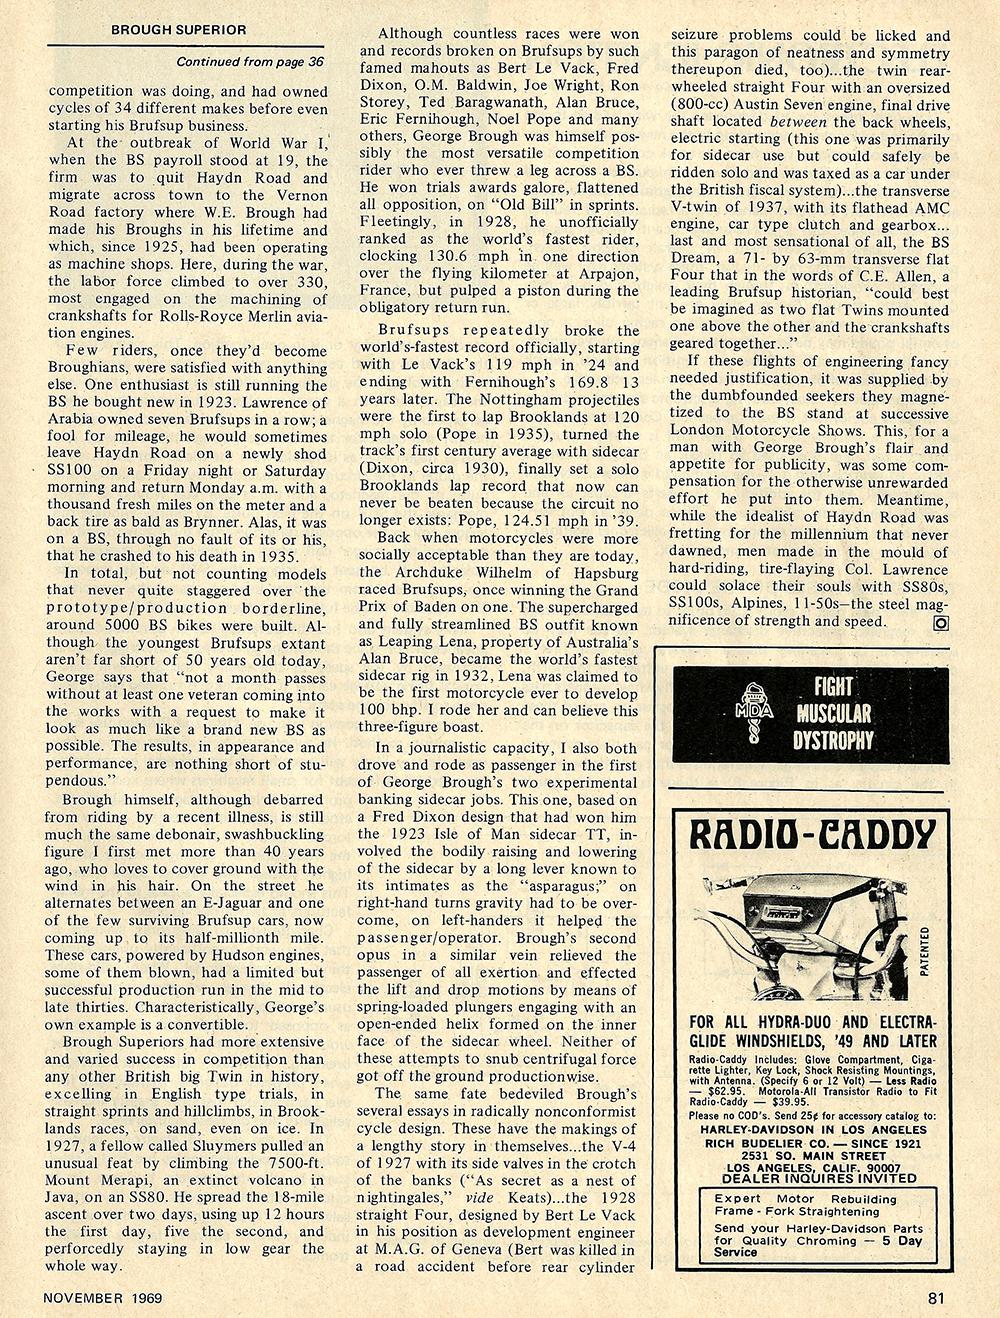 History of Brough Superior 05.jpg